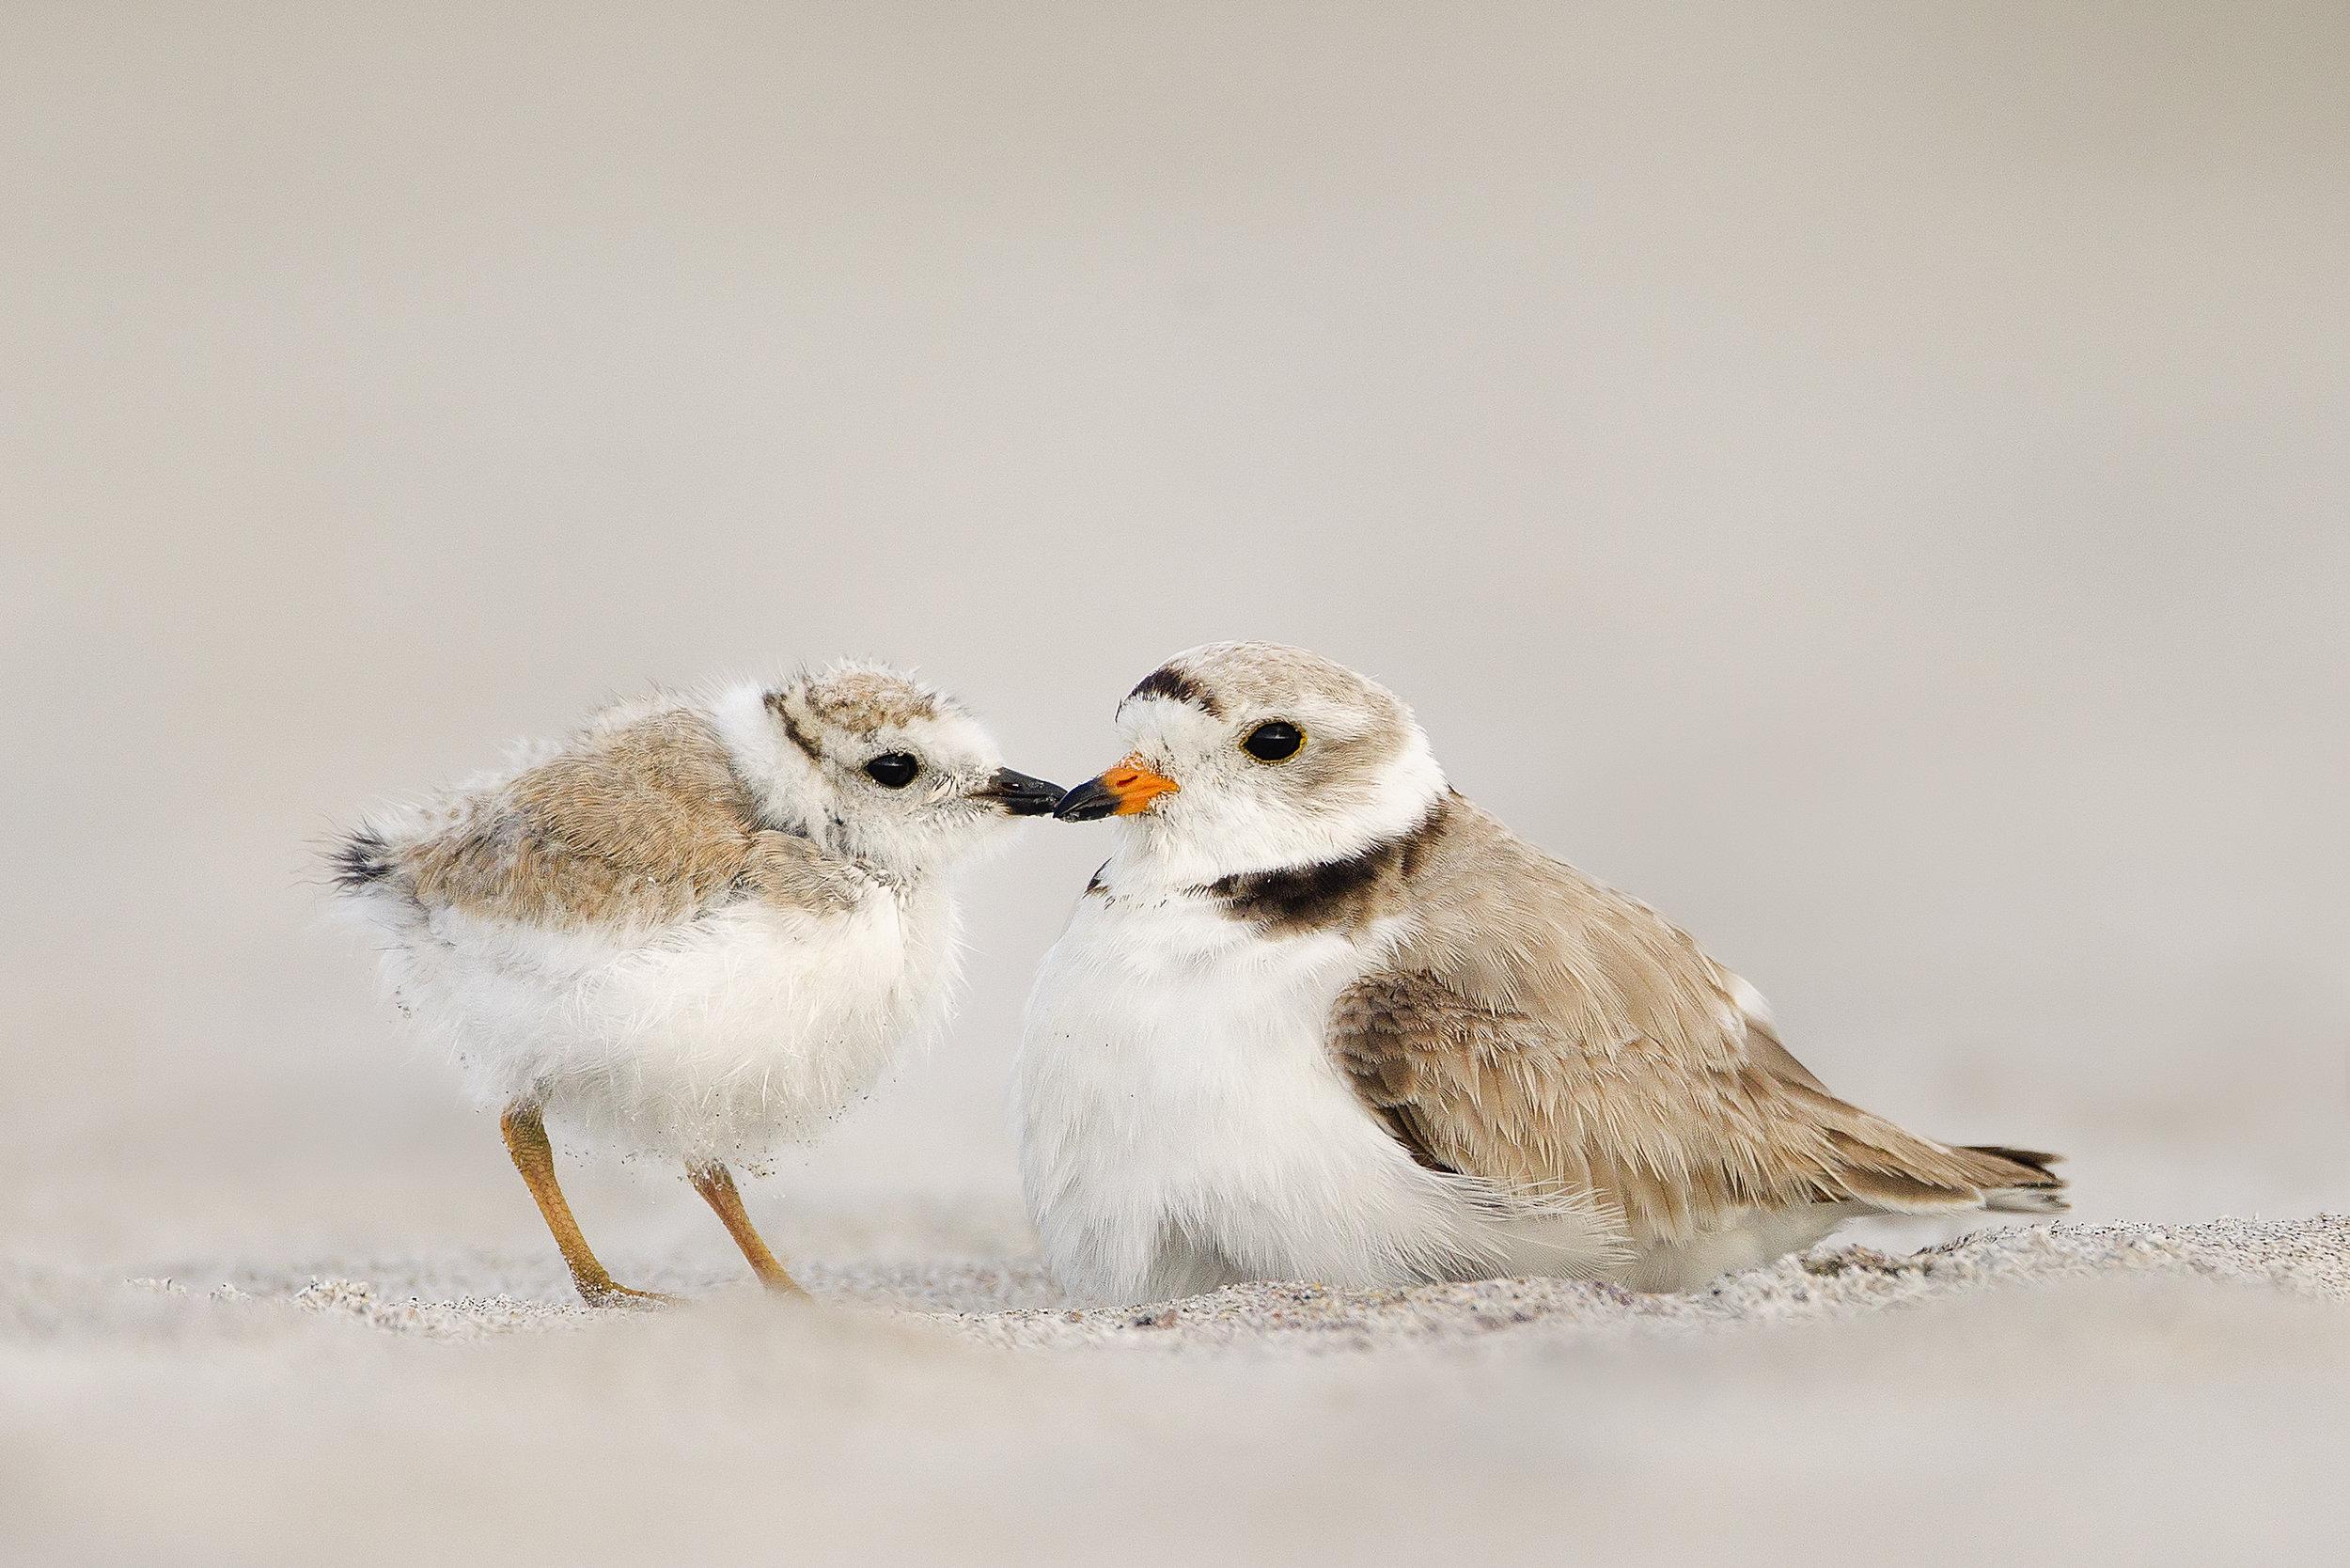 Piping Plover, Melissa Groo/Audubon Photography Awards